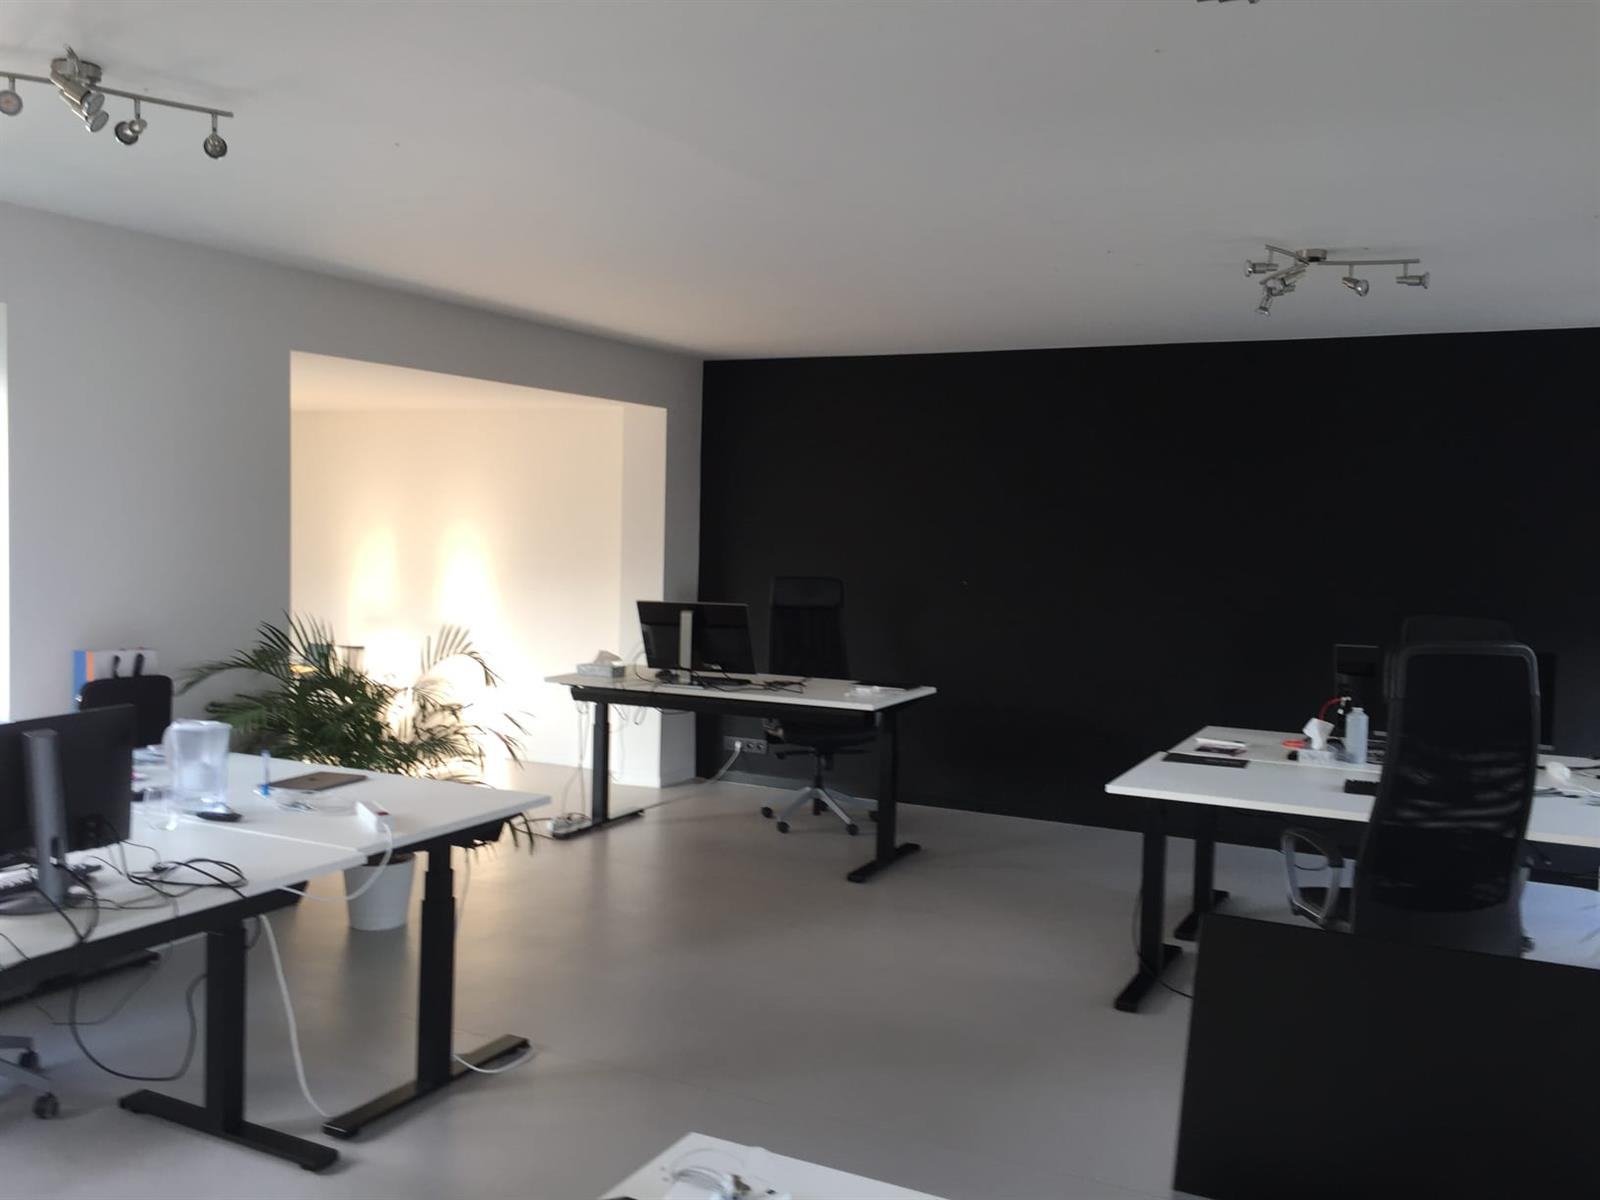 kantoor te huur K003 - Middelmolenlaan 96, 2100 Antwerpen Deurne, België 13